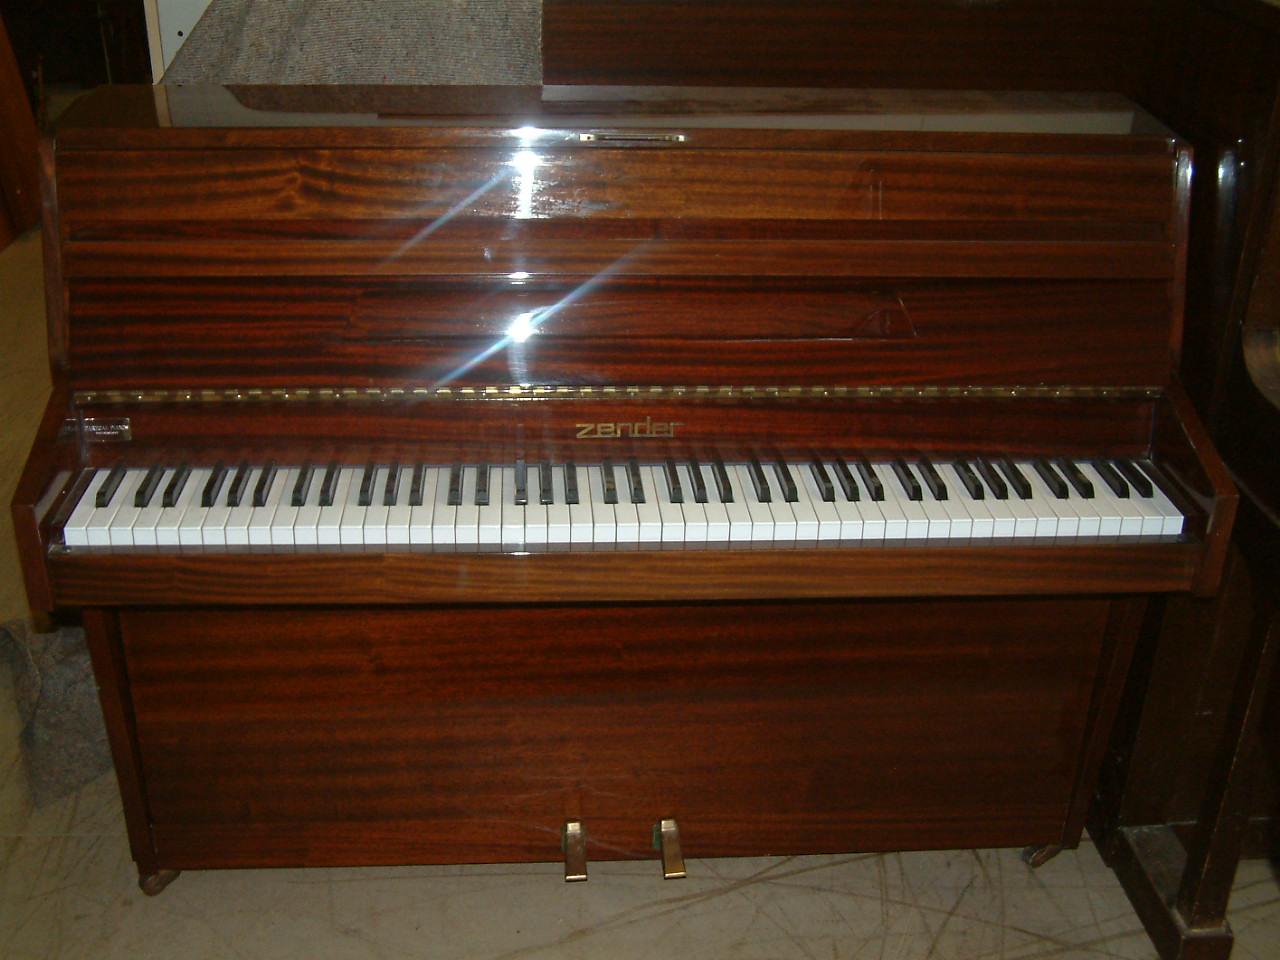 Zender Very Small Modern Piano In A Mahogany Gloss Cabinet